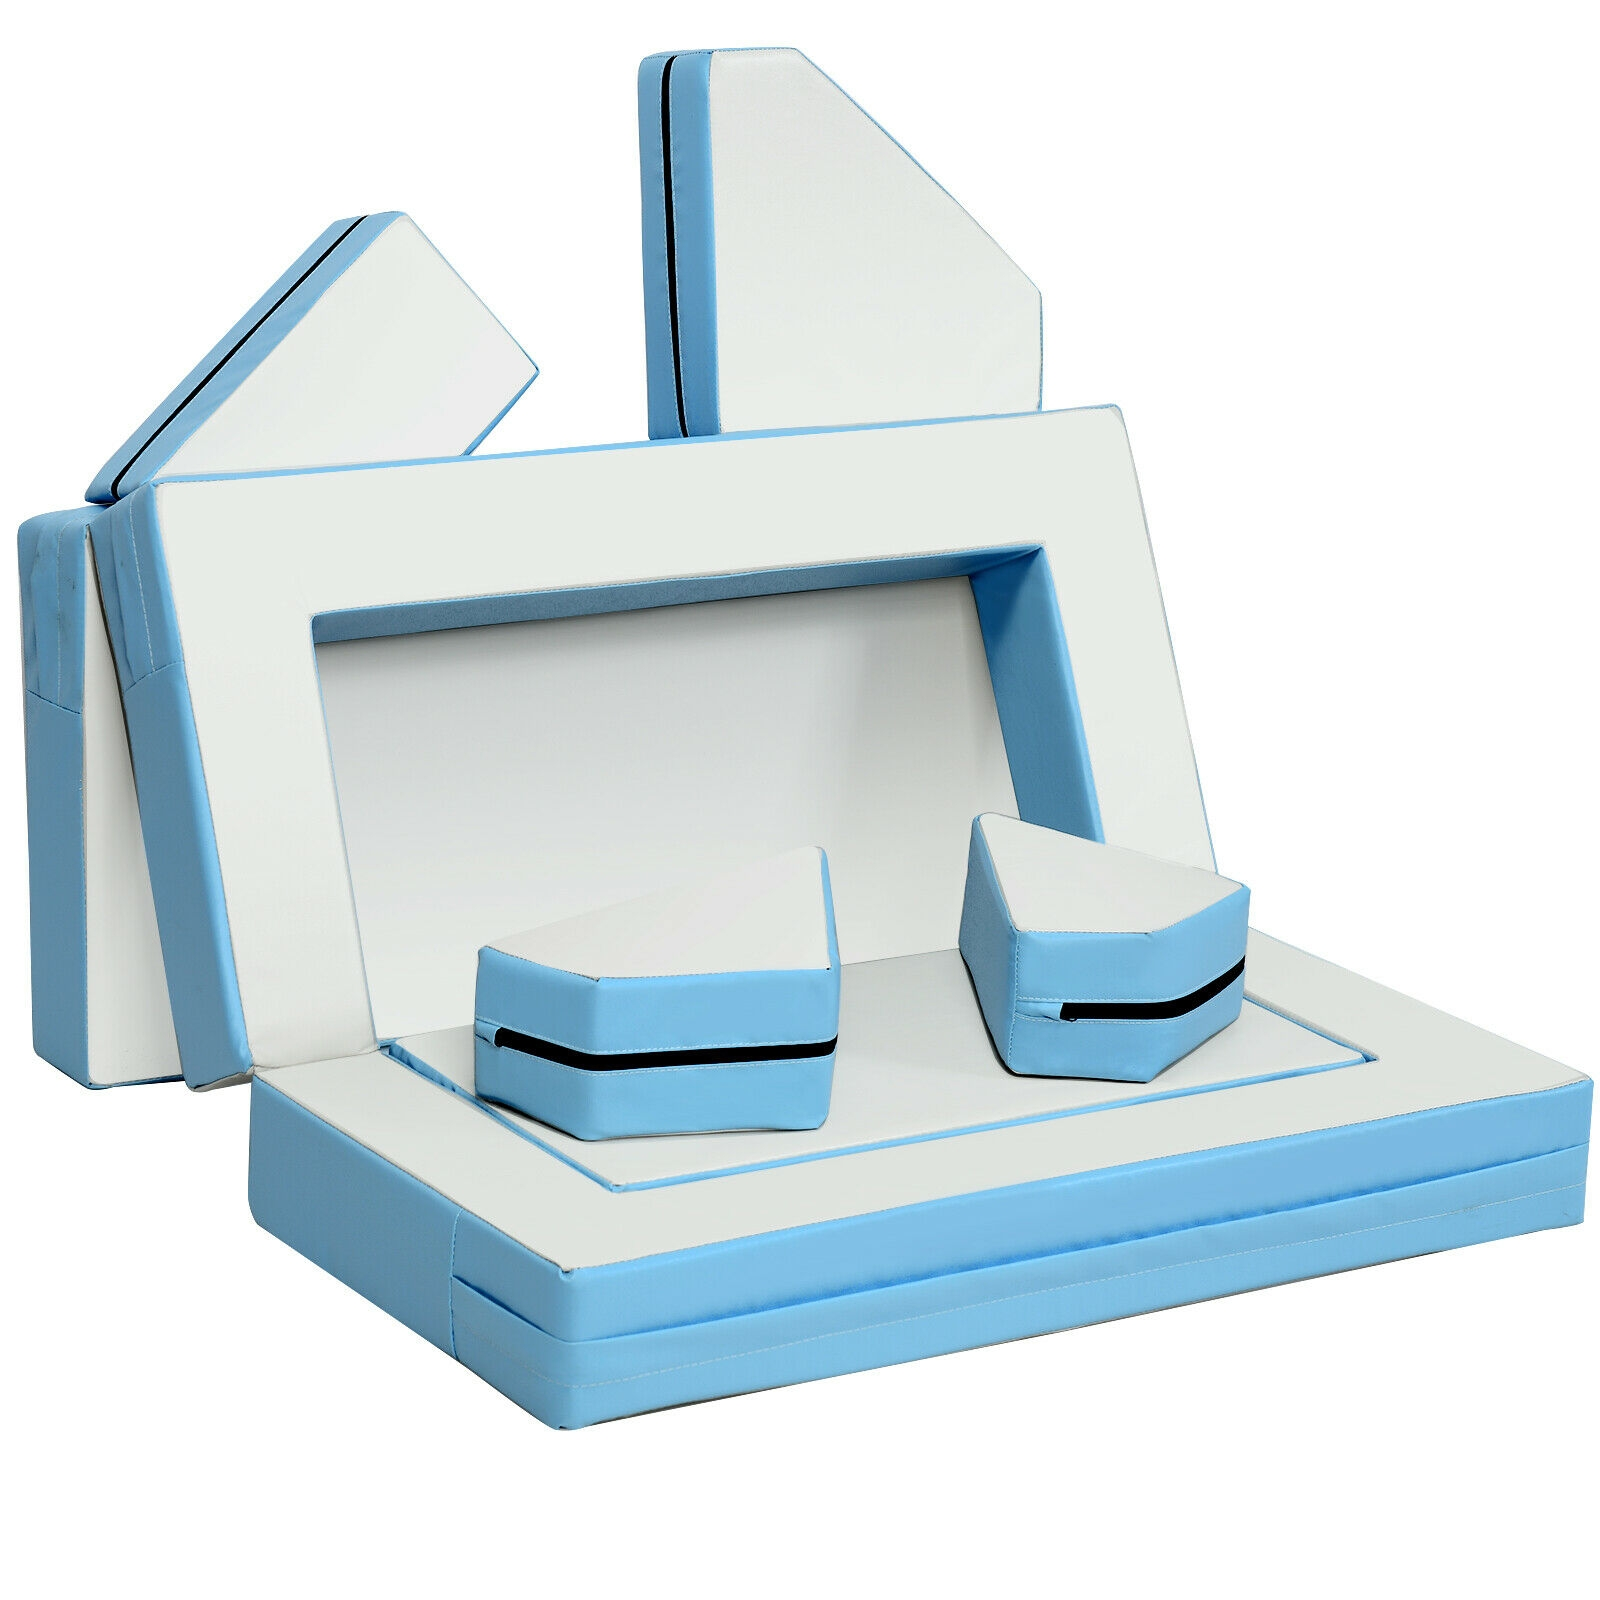 Image of 4-in-1 Crawl Climb Foam Shapes Toddler Kids Playset